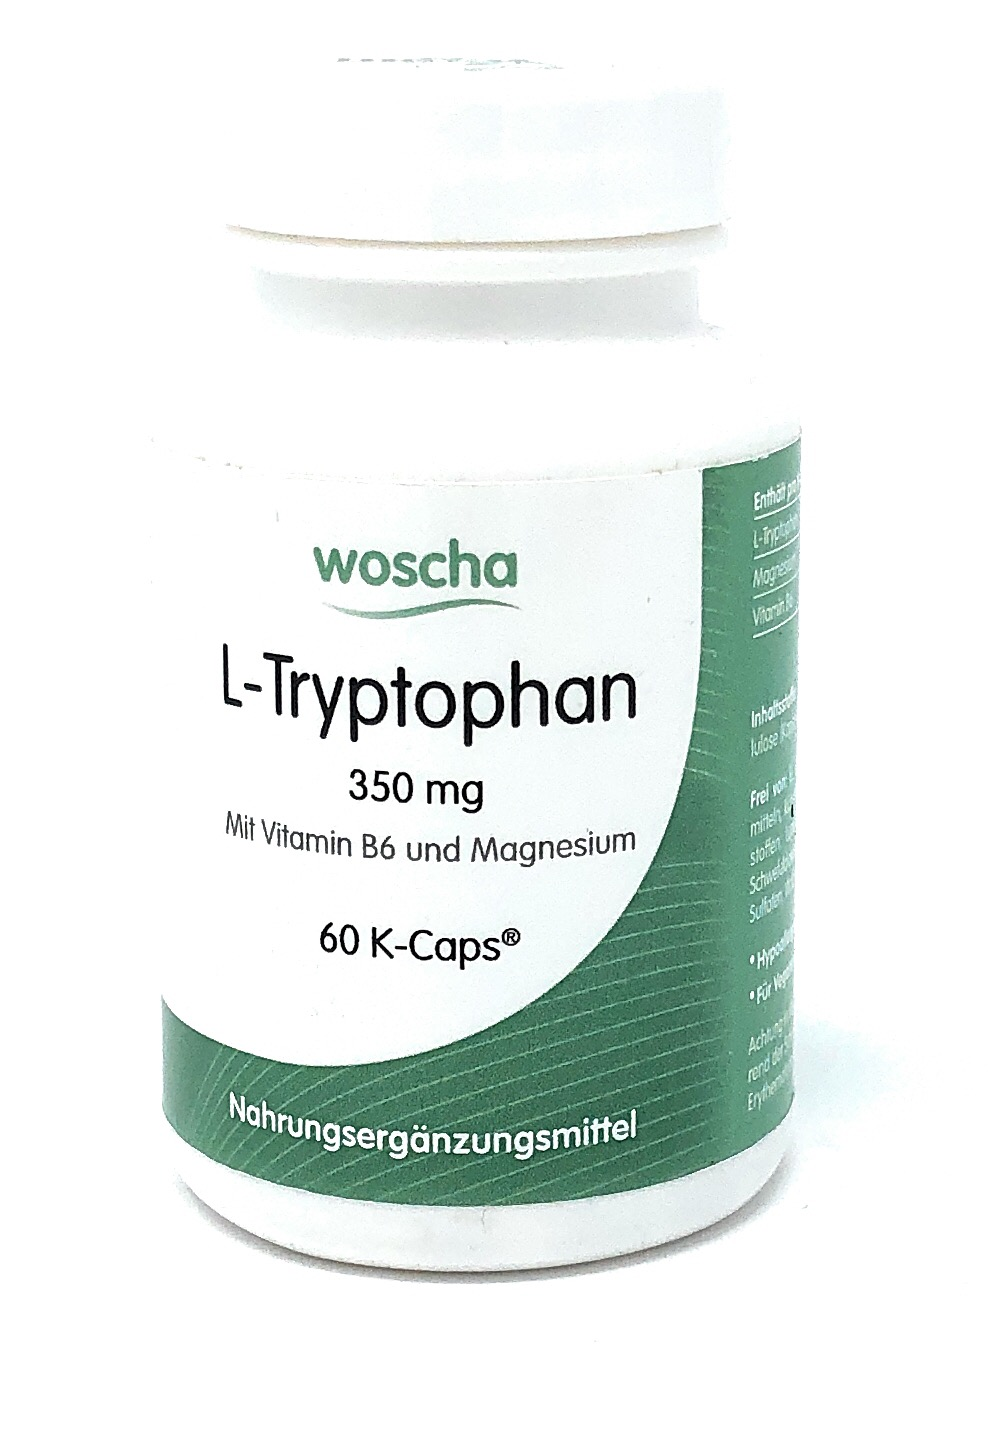 woscha L-Tryptophan 60 K-Caps (35g) (vegan)